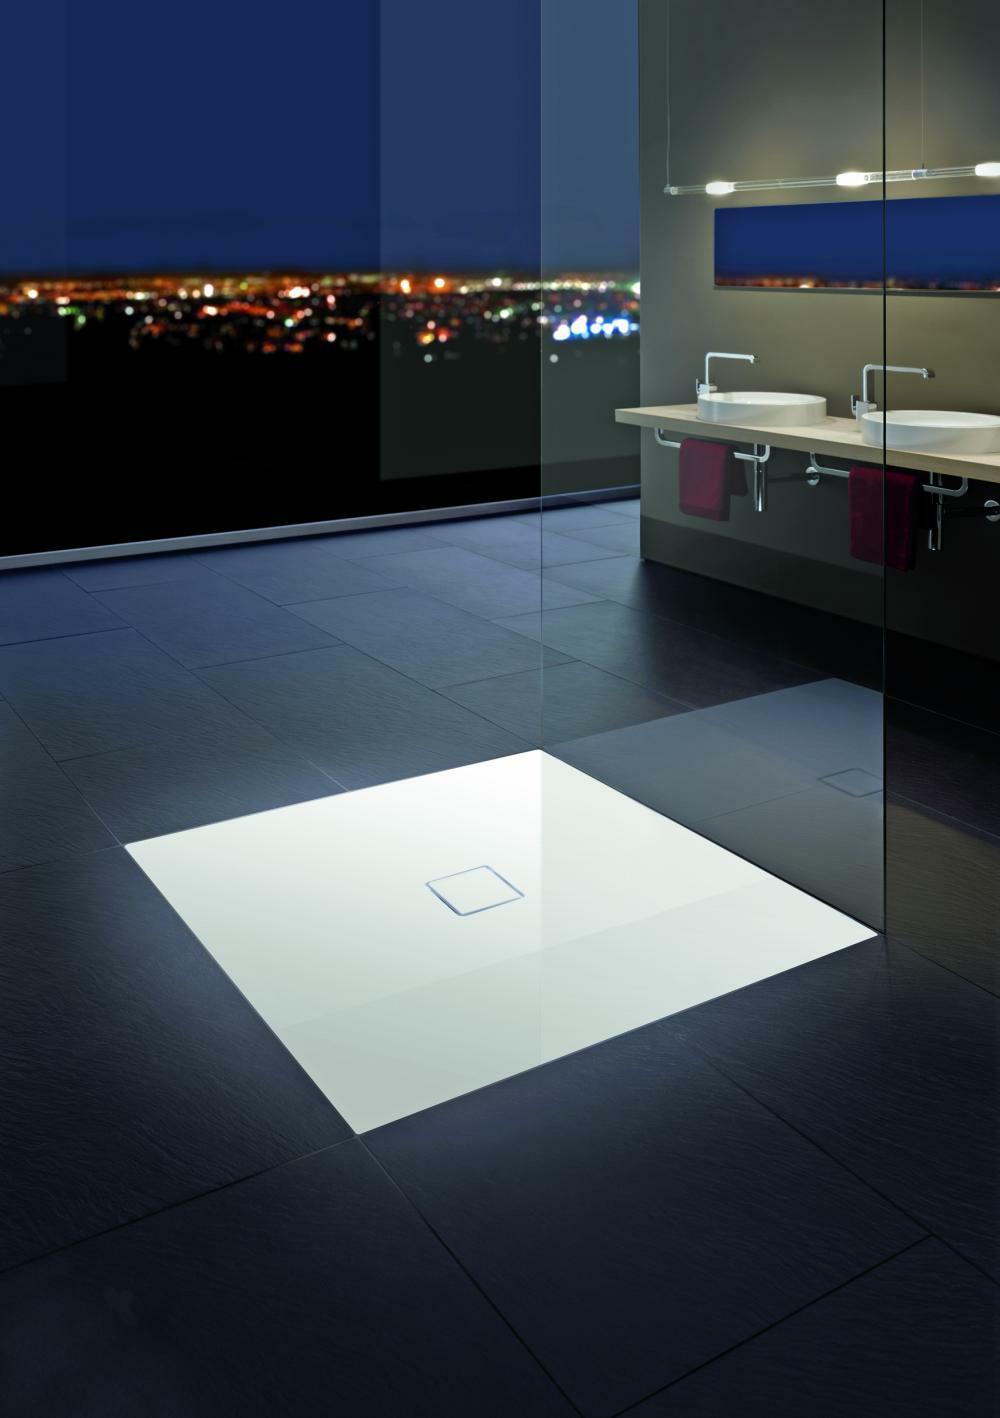 allgemein tga innova press seite 40. Black Bedroom Furniture Sets. Home Design Ideas